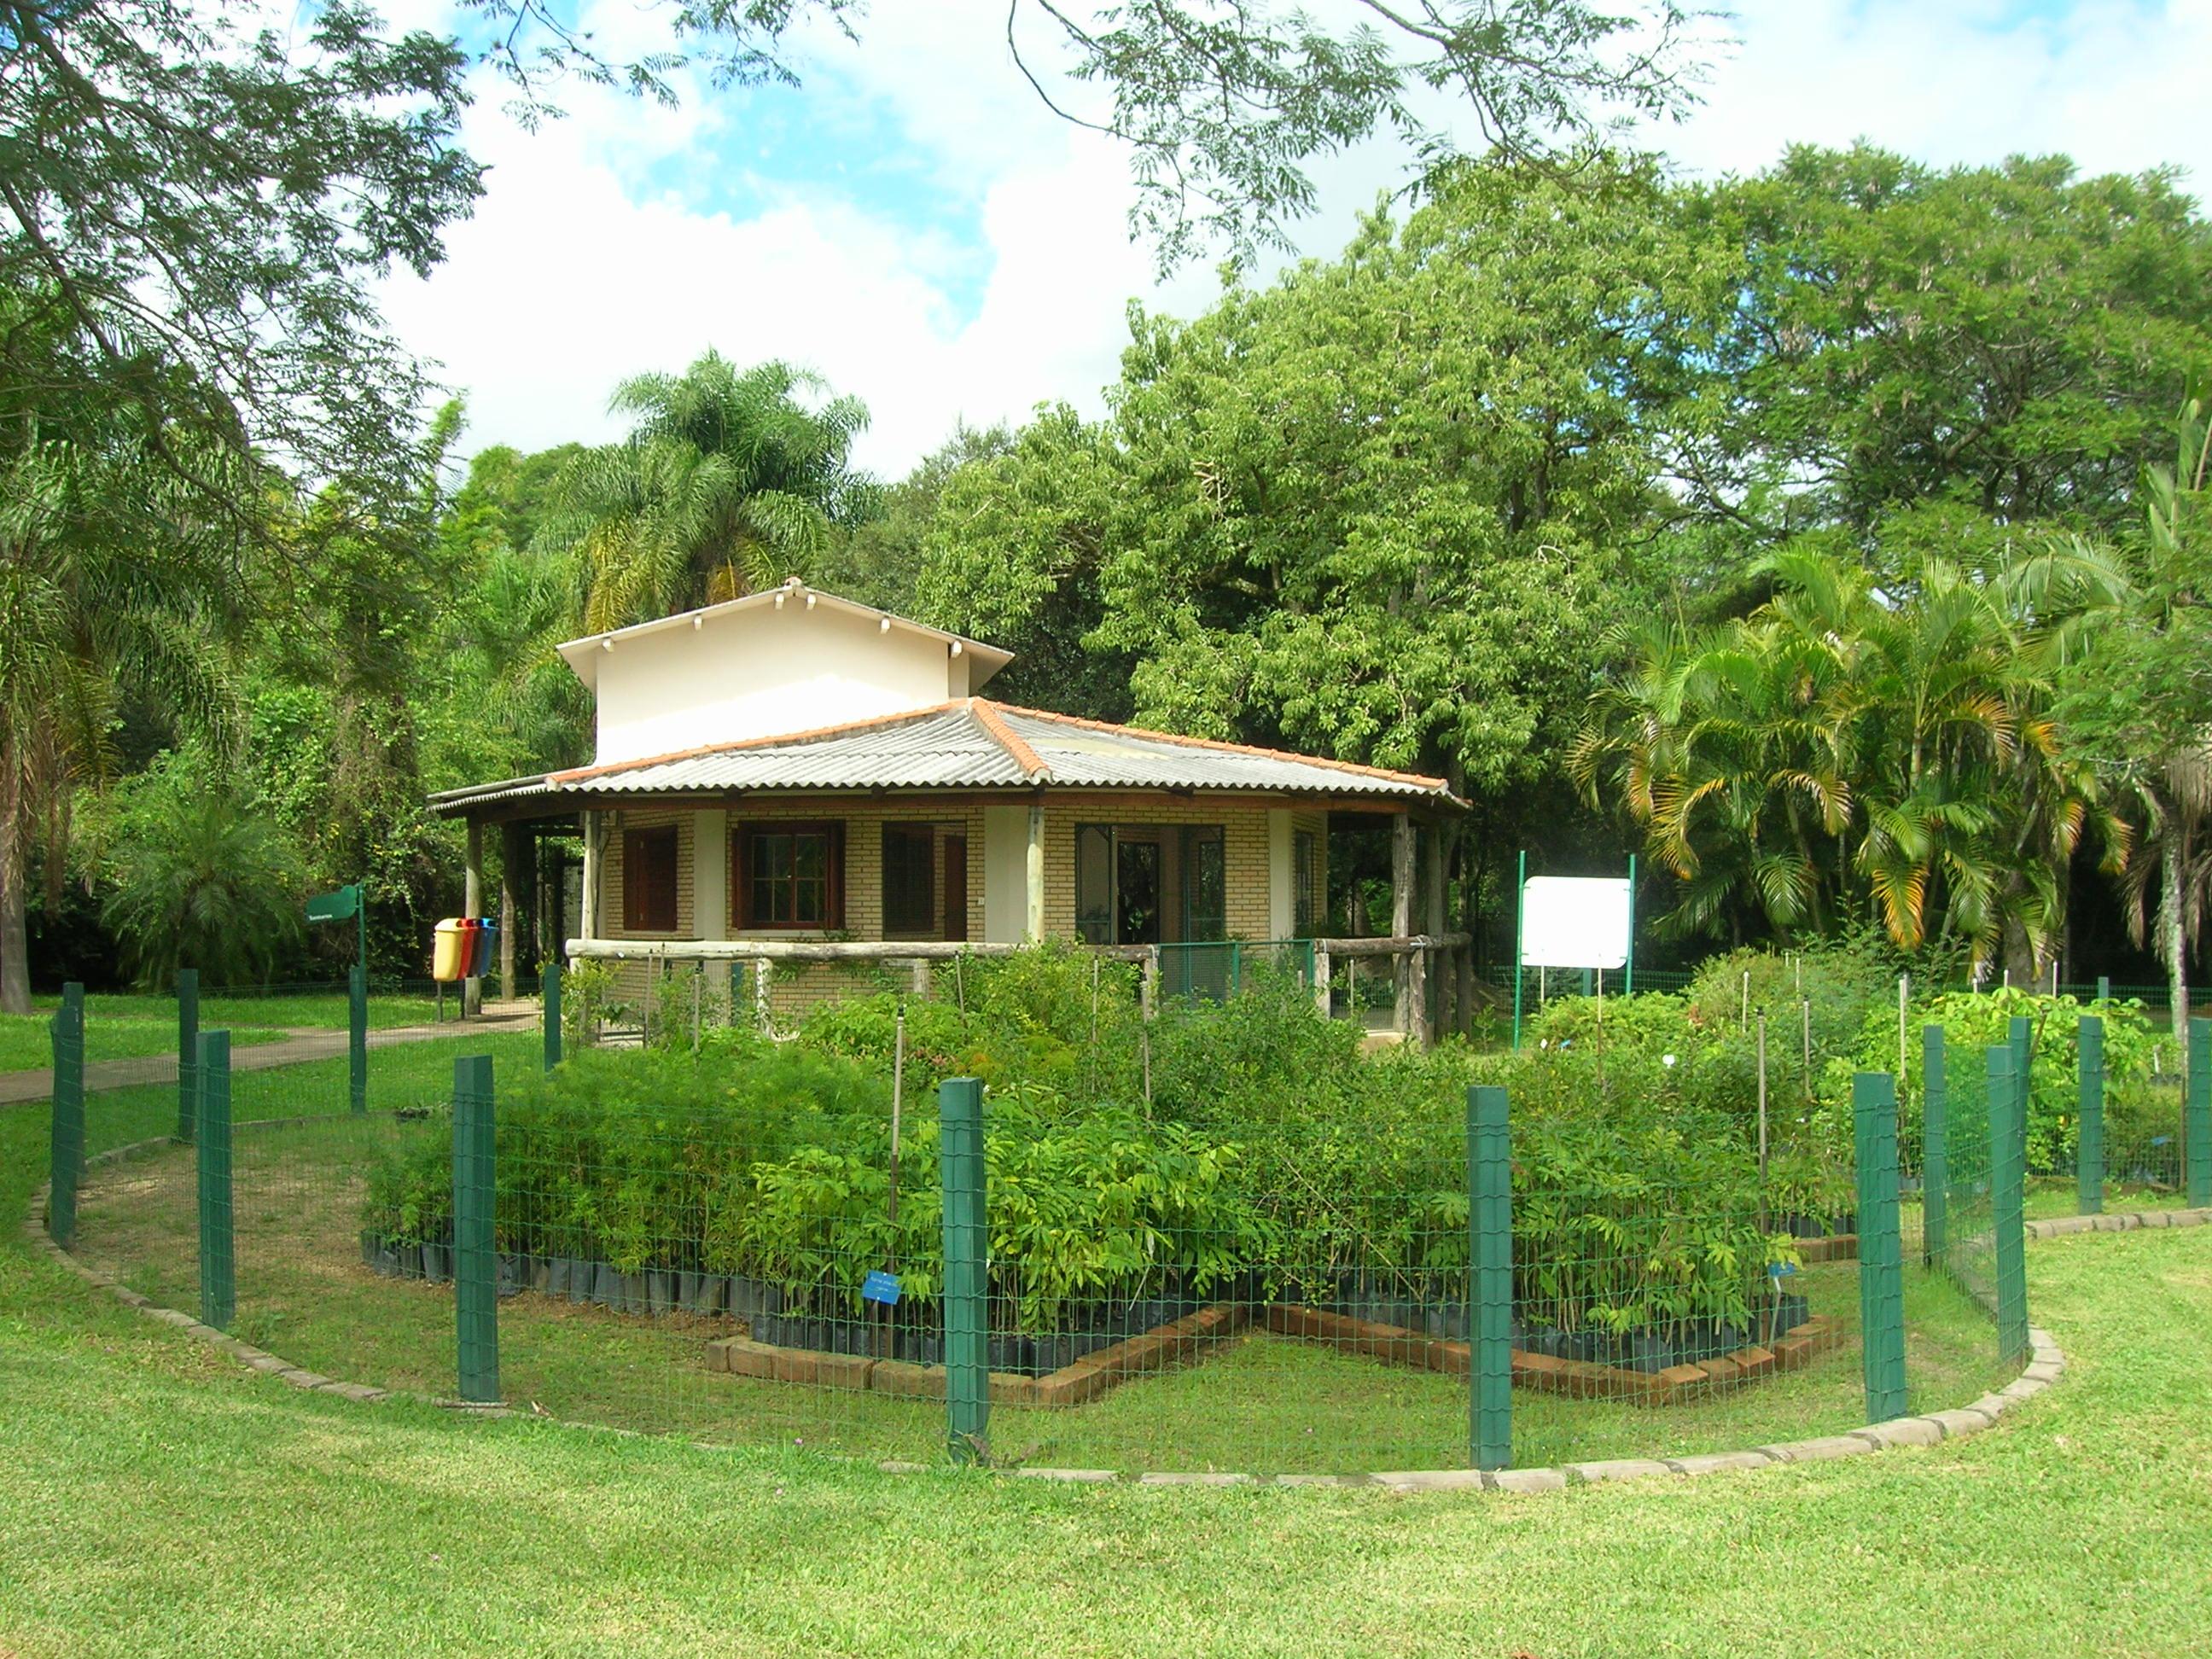 fotos jardim botanico porto alegre : fotos jardim botanico porto alegre:File:Viveiro jardim botânico porto alegre.JPG – Wikimedia Commons